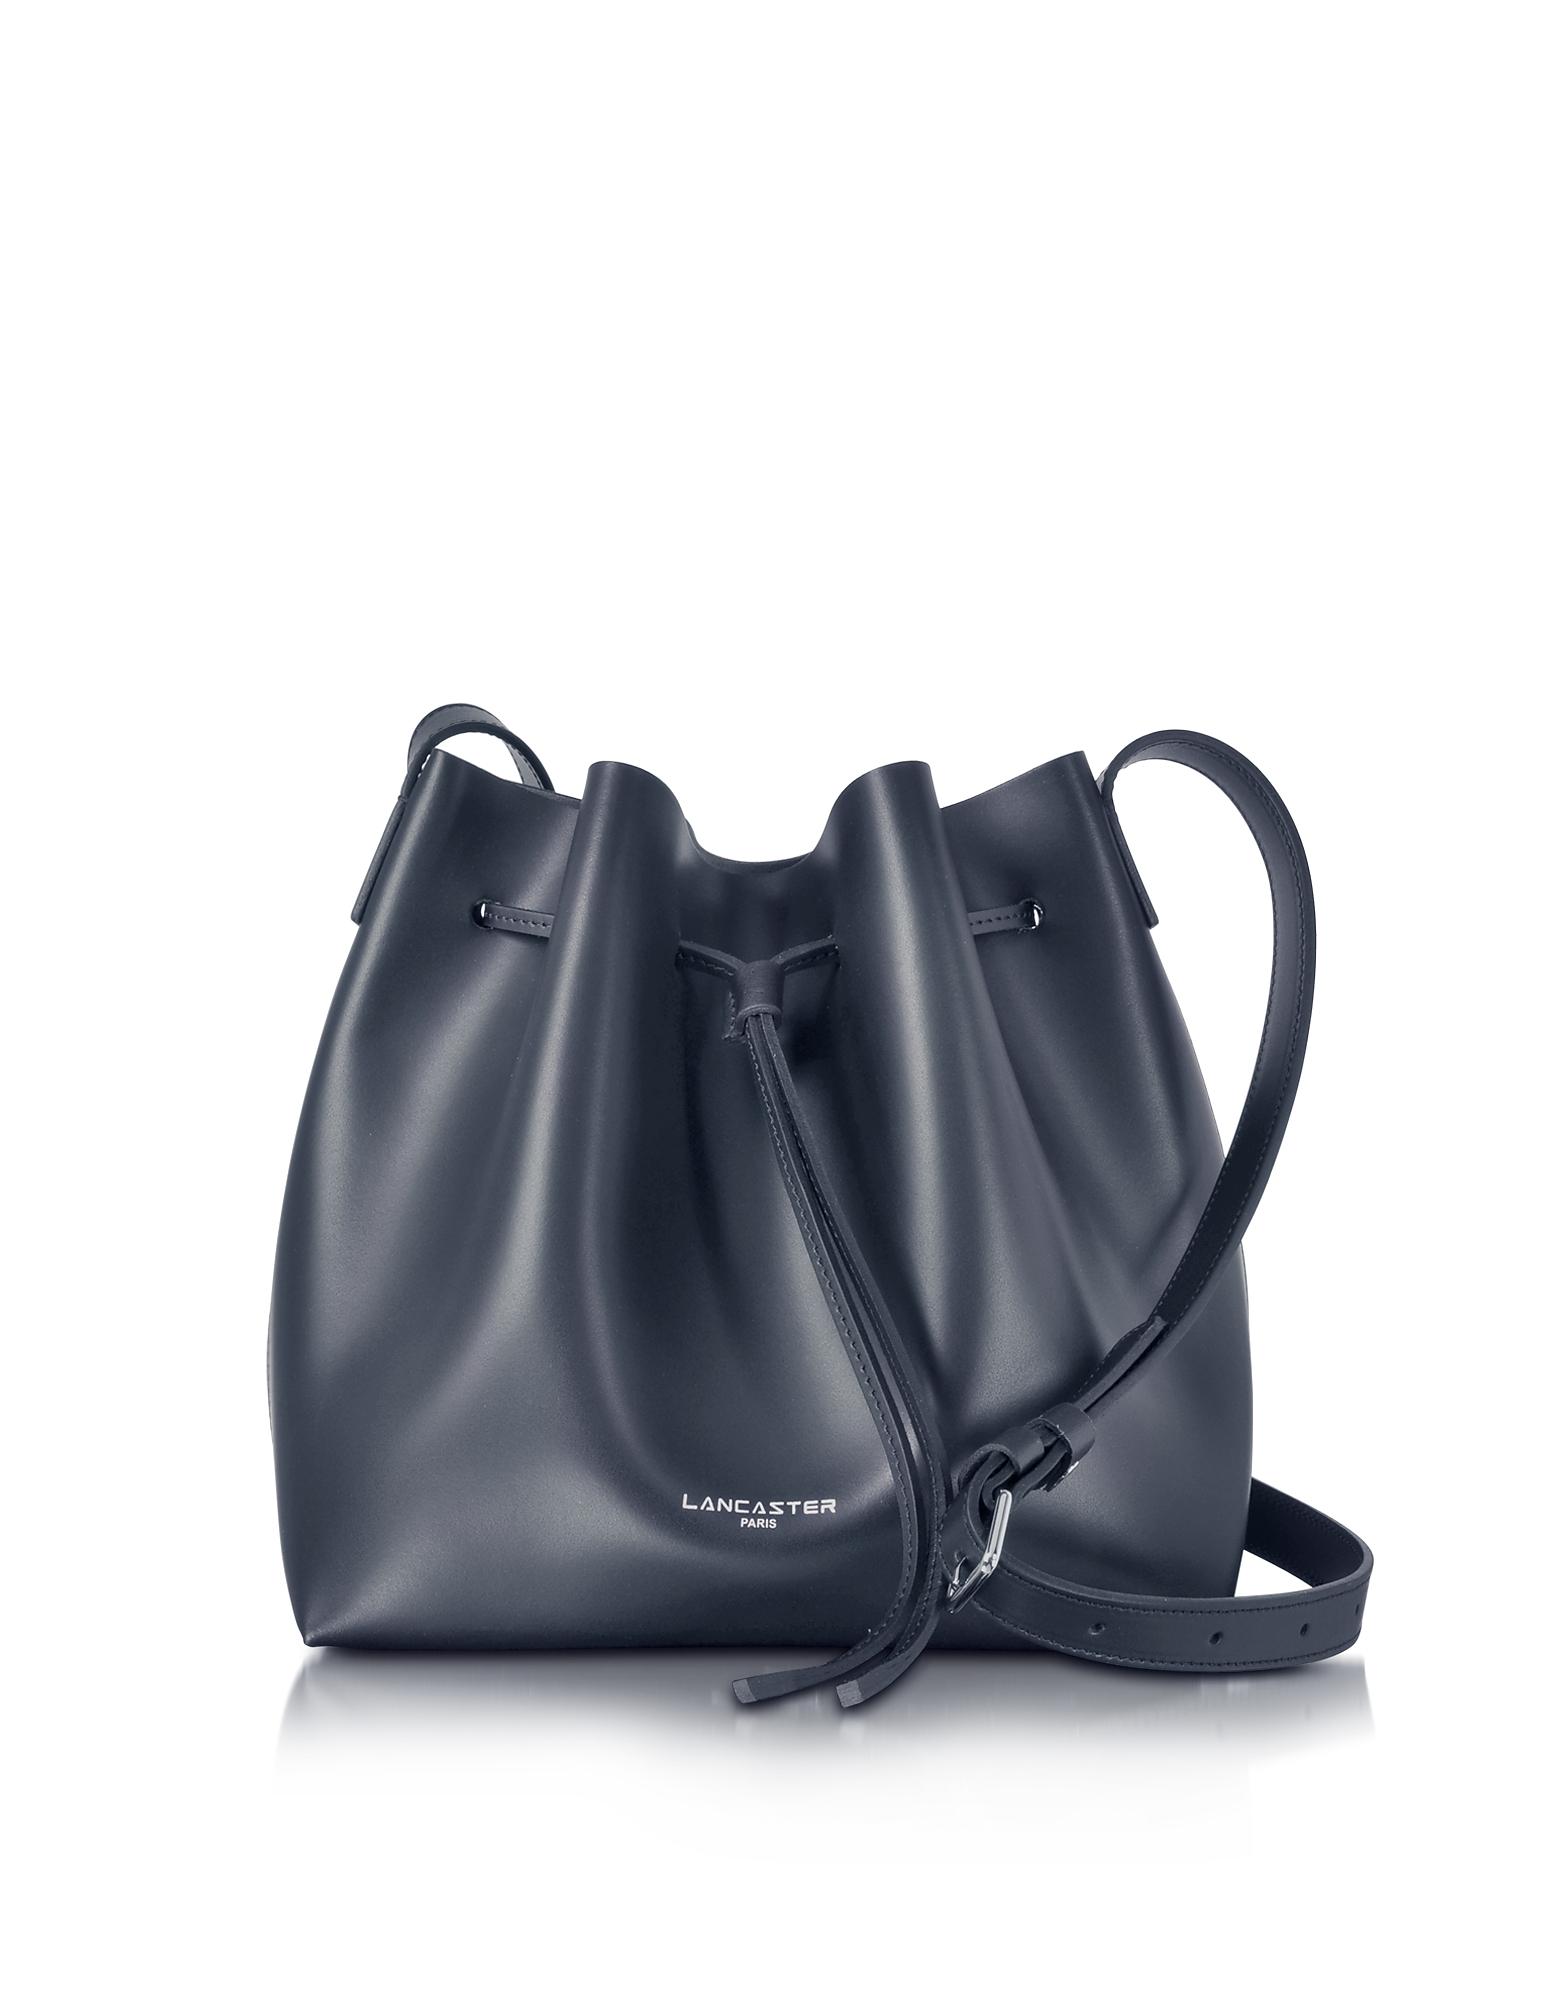 Lancaster Paris Handbags, Pur Smooth Leather Bucket Bag